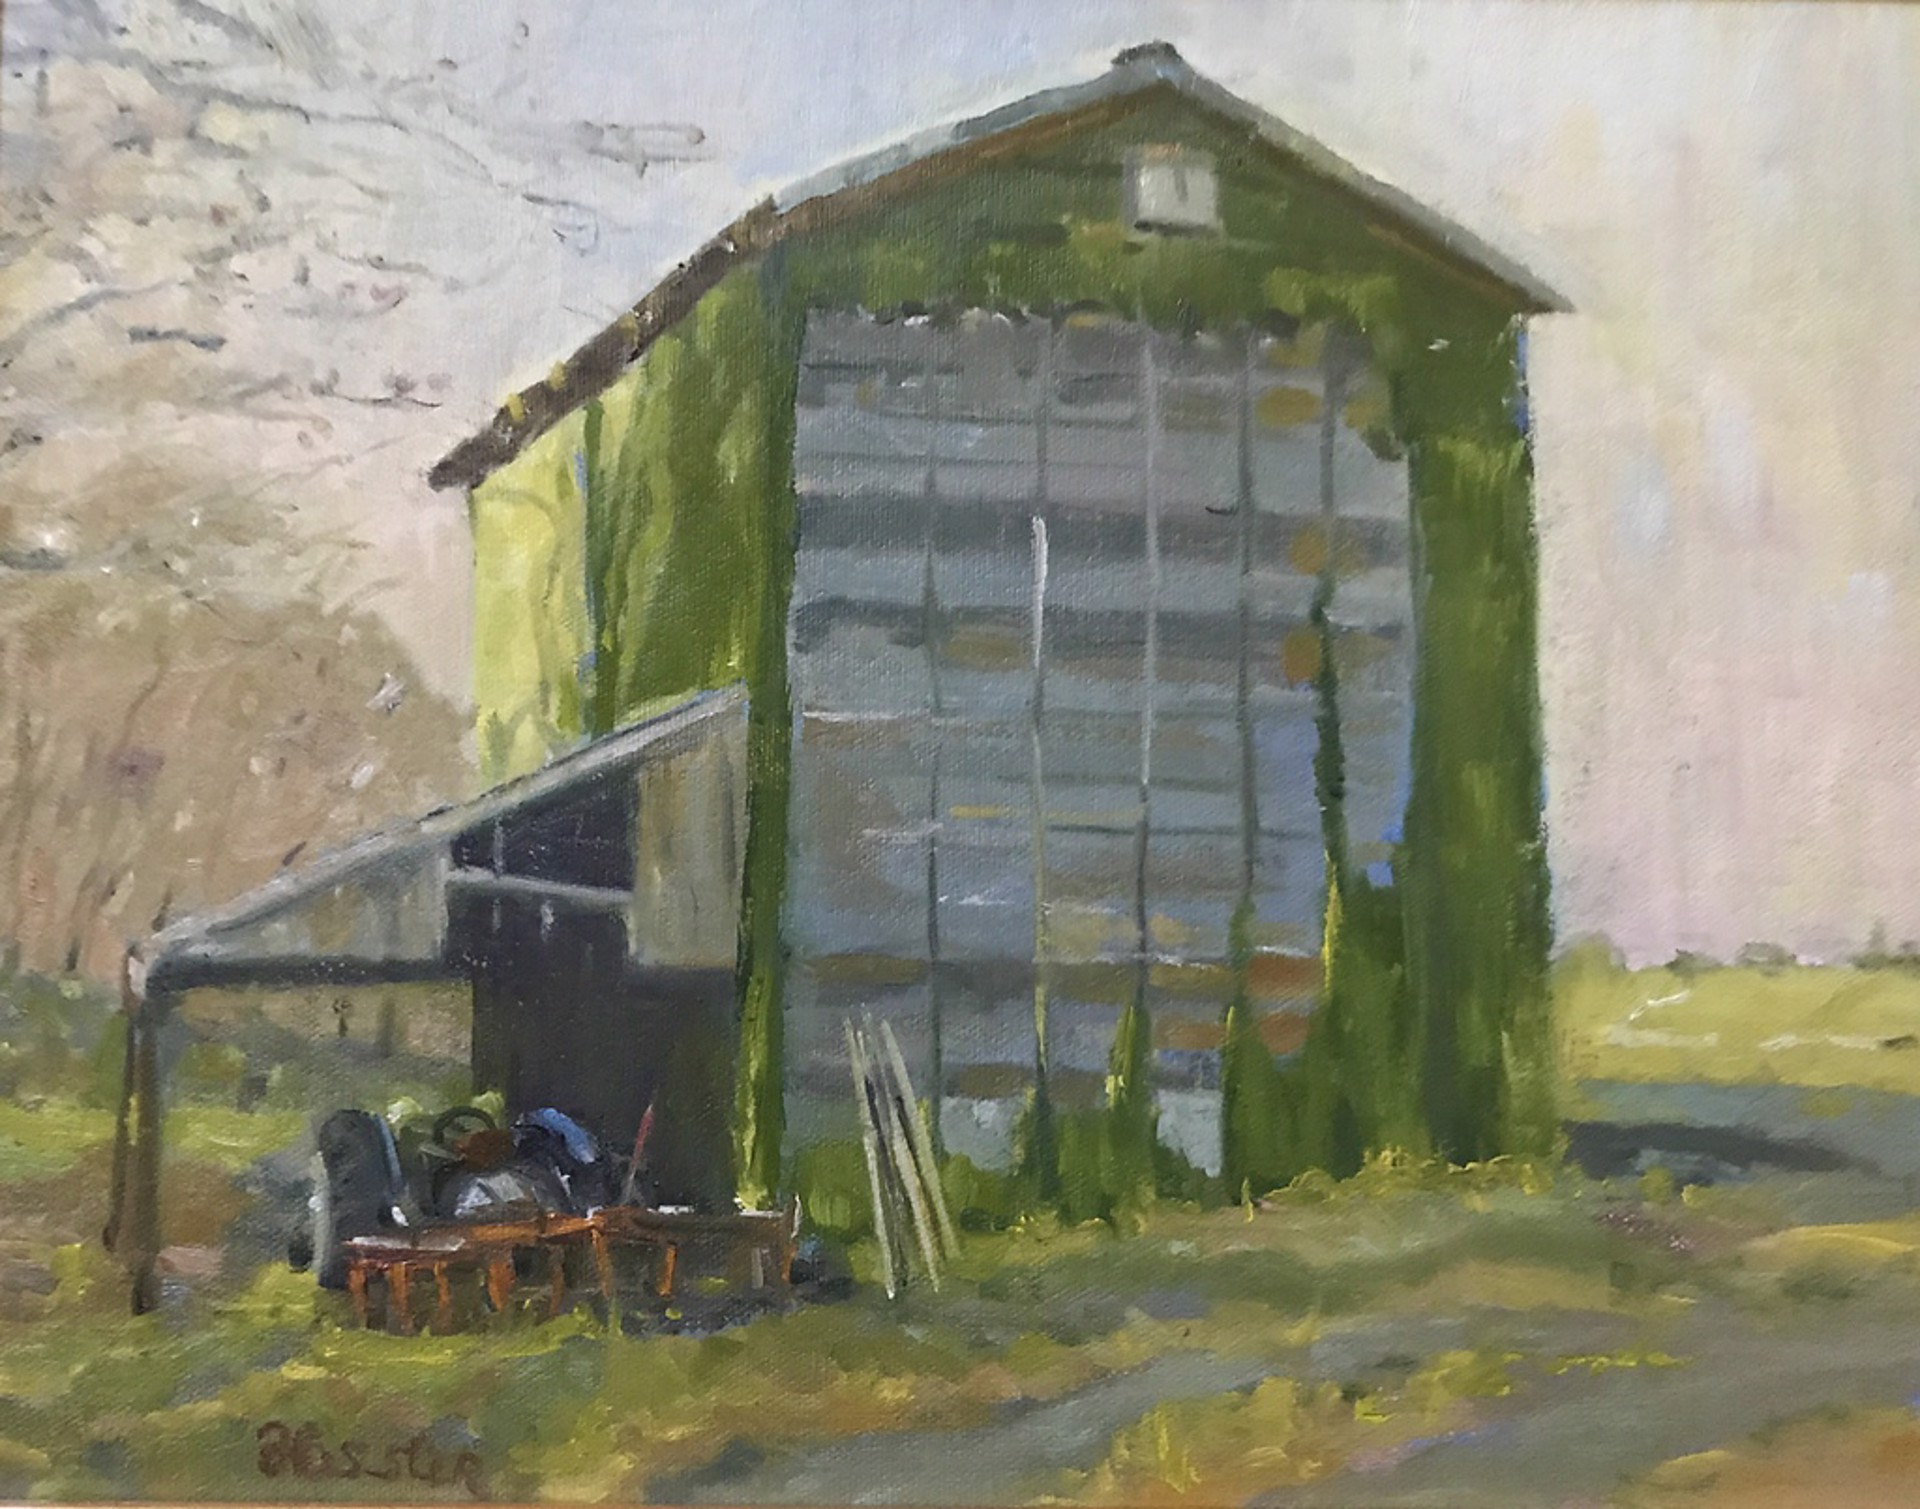 Southern Exposure by Steve Hessler